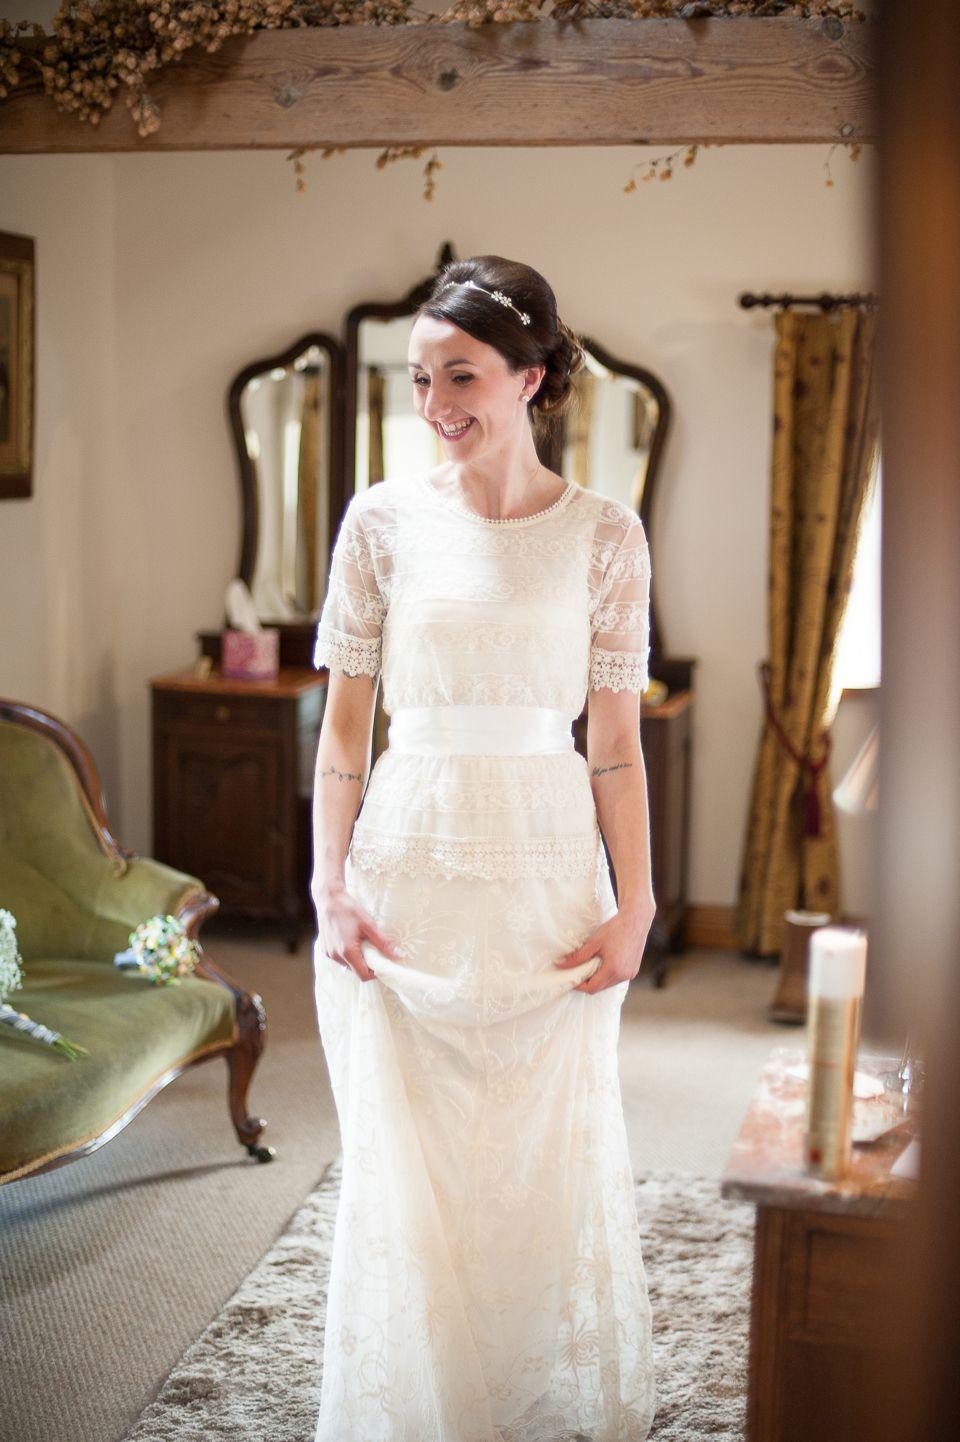 A Zara Wedding Dress For A Diy And Handcrafted Spring Yellow Wedding Love My Dress Uk Wedding Blog Wedding Directory Modest Lace Wedding Dresses Zara Wedding Dress Wedding Dress Inspiration [ 1442 x 960 Pixel ]